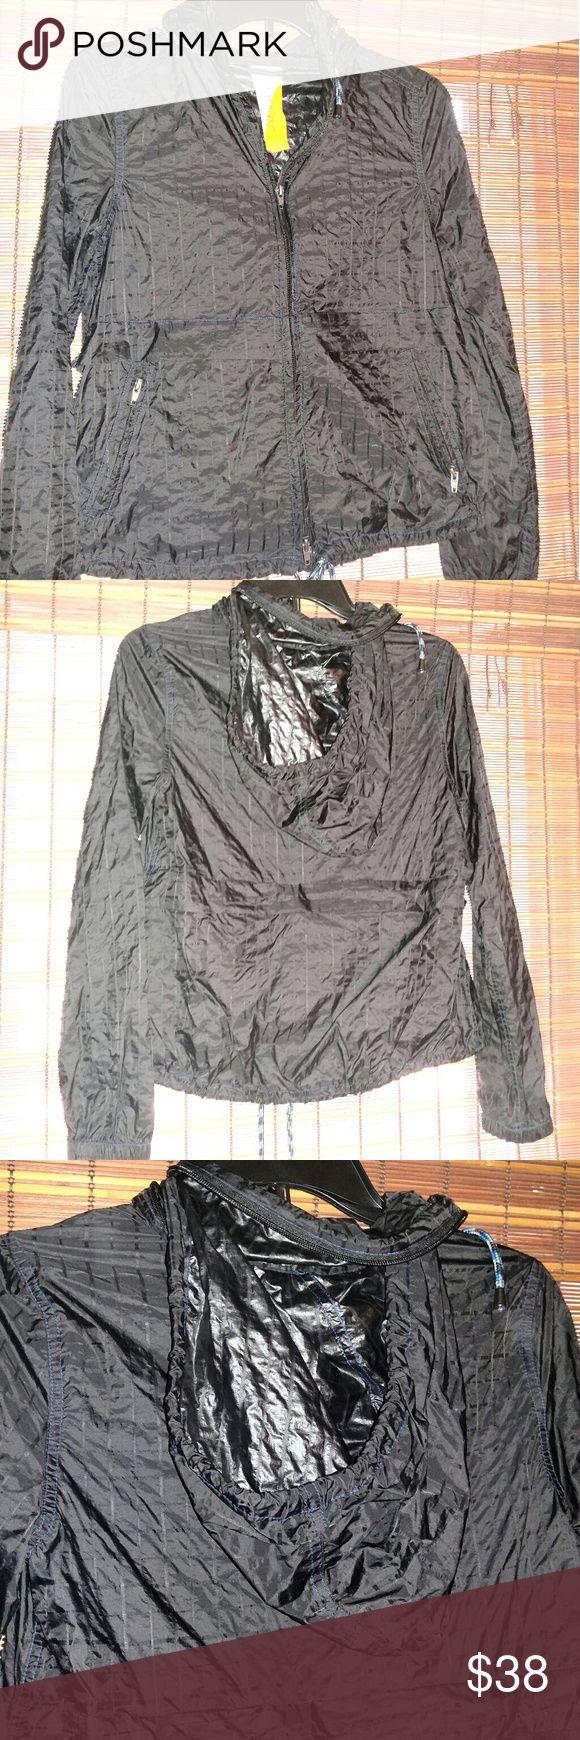 Free people rain coat Size xs black rain coat. Like new hood zips into collar. Very nice rain coat lightweight.... Free People Jackets & Coats Trench Coats